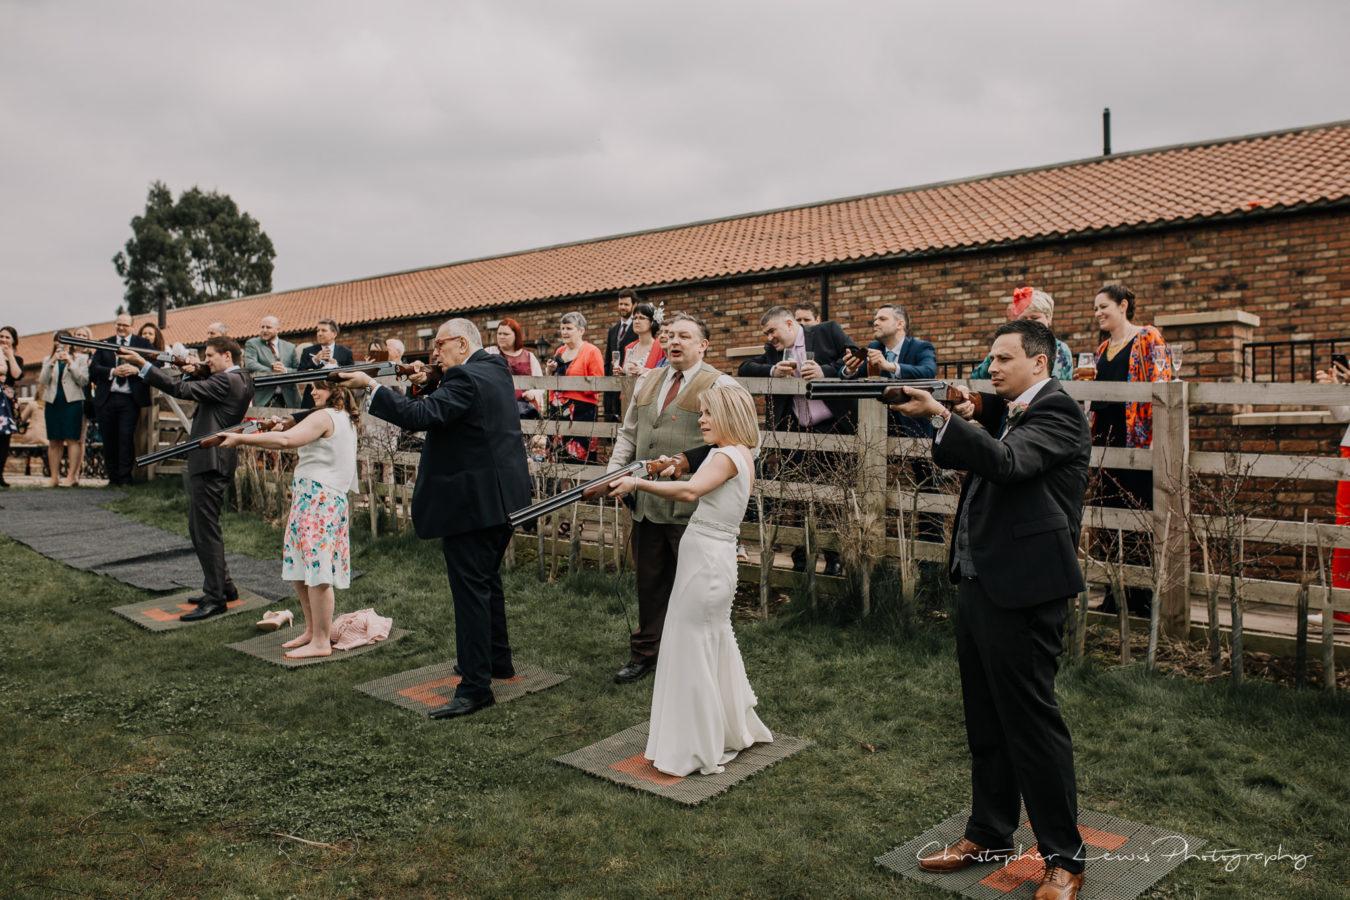 Thief-Hall-Wedding-Christopher-Lewis-Photography-49